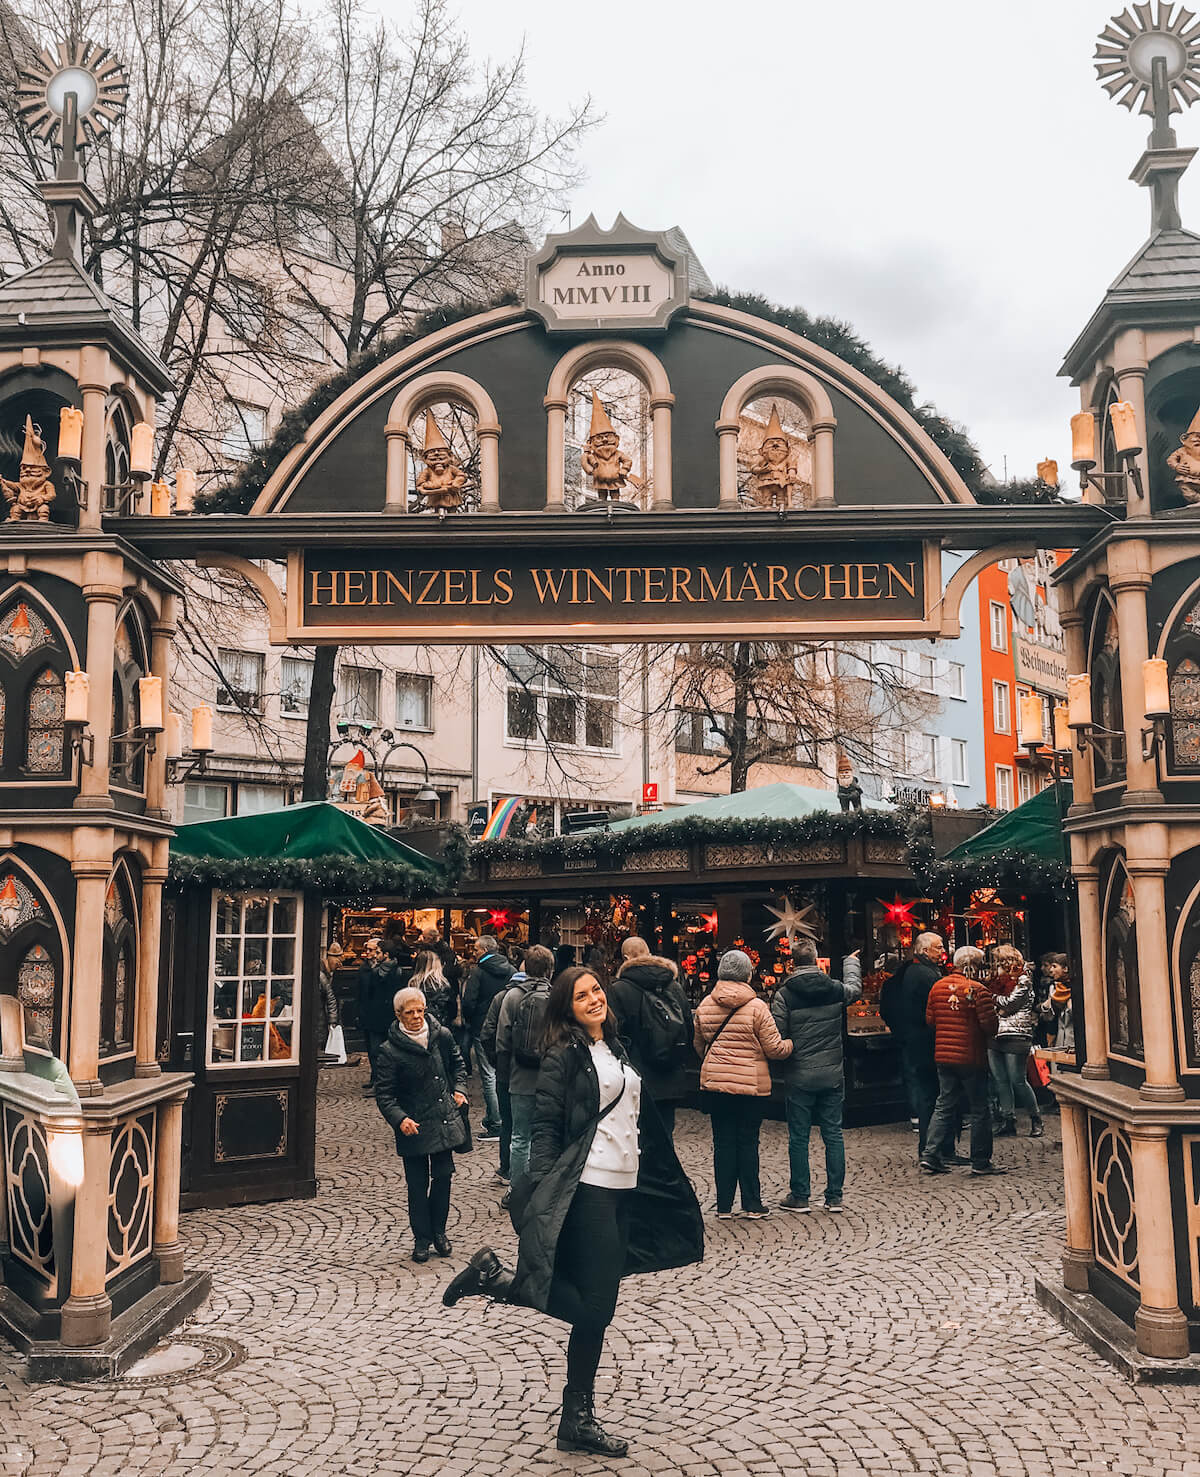 Heinzels Wintermarchen Alter Market in Cologne, Germany